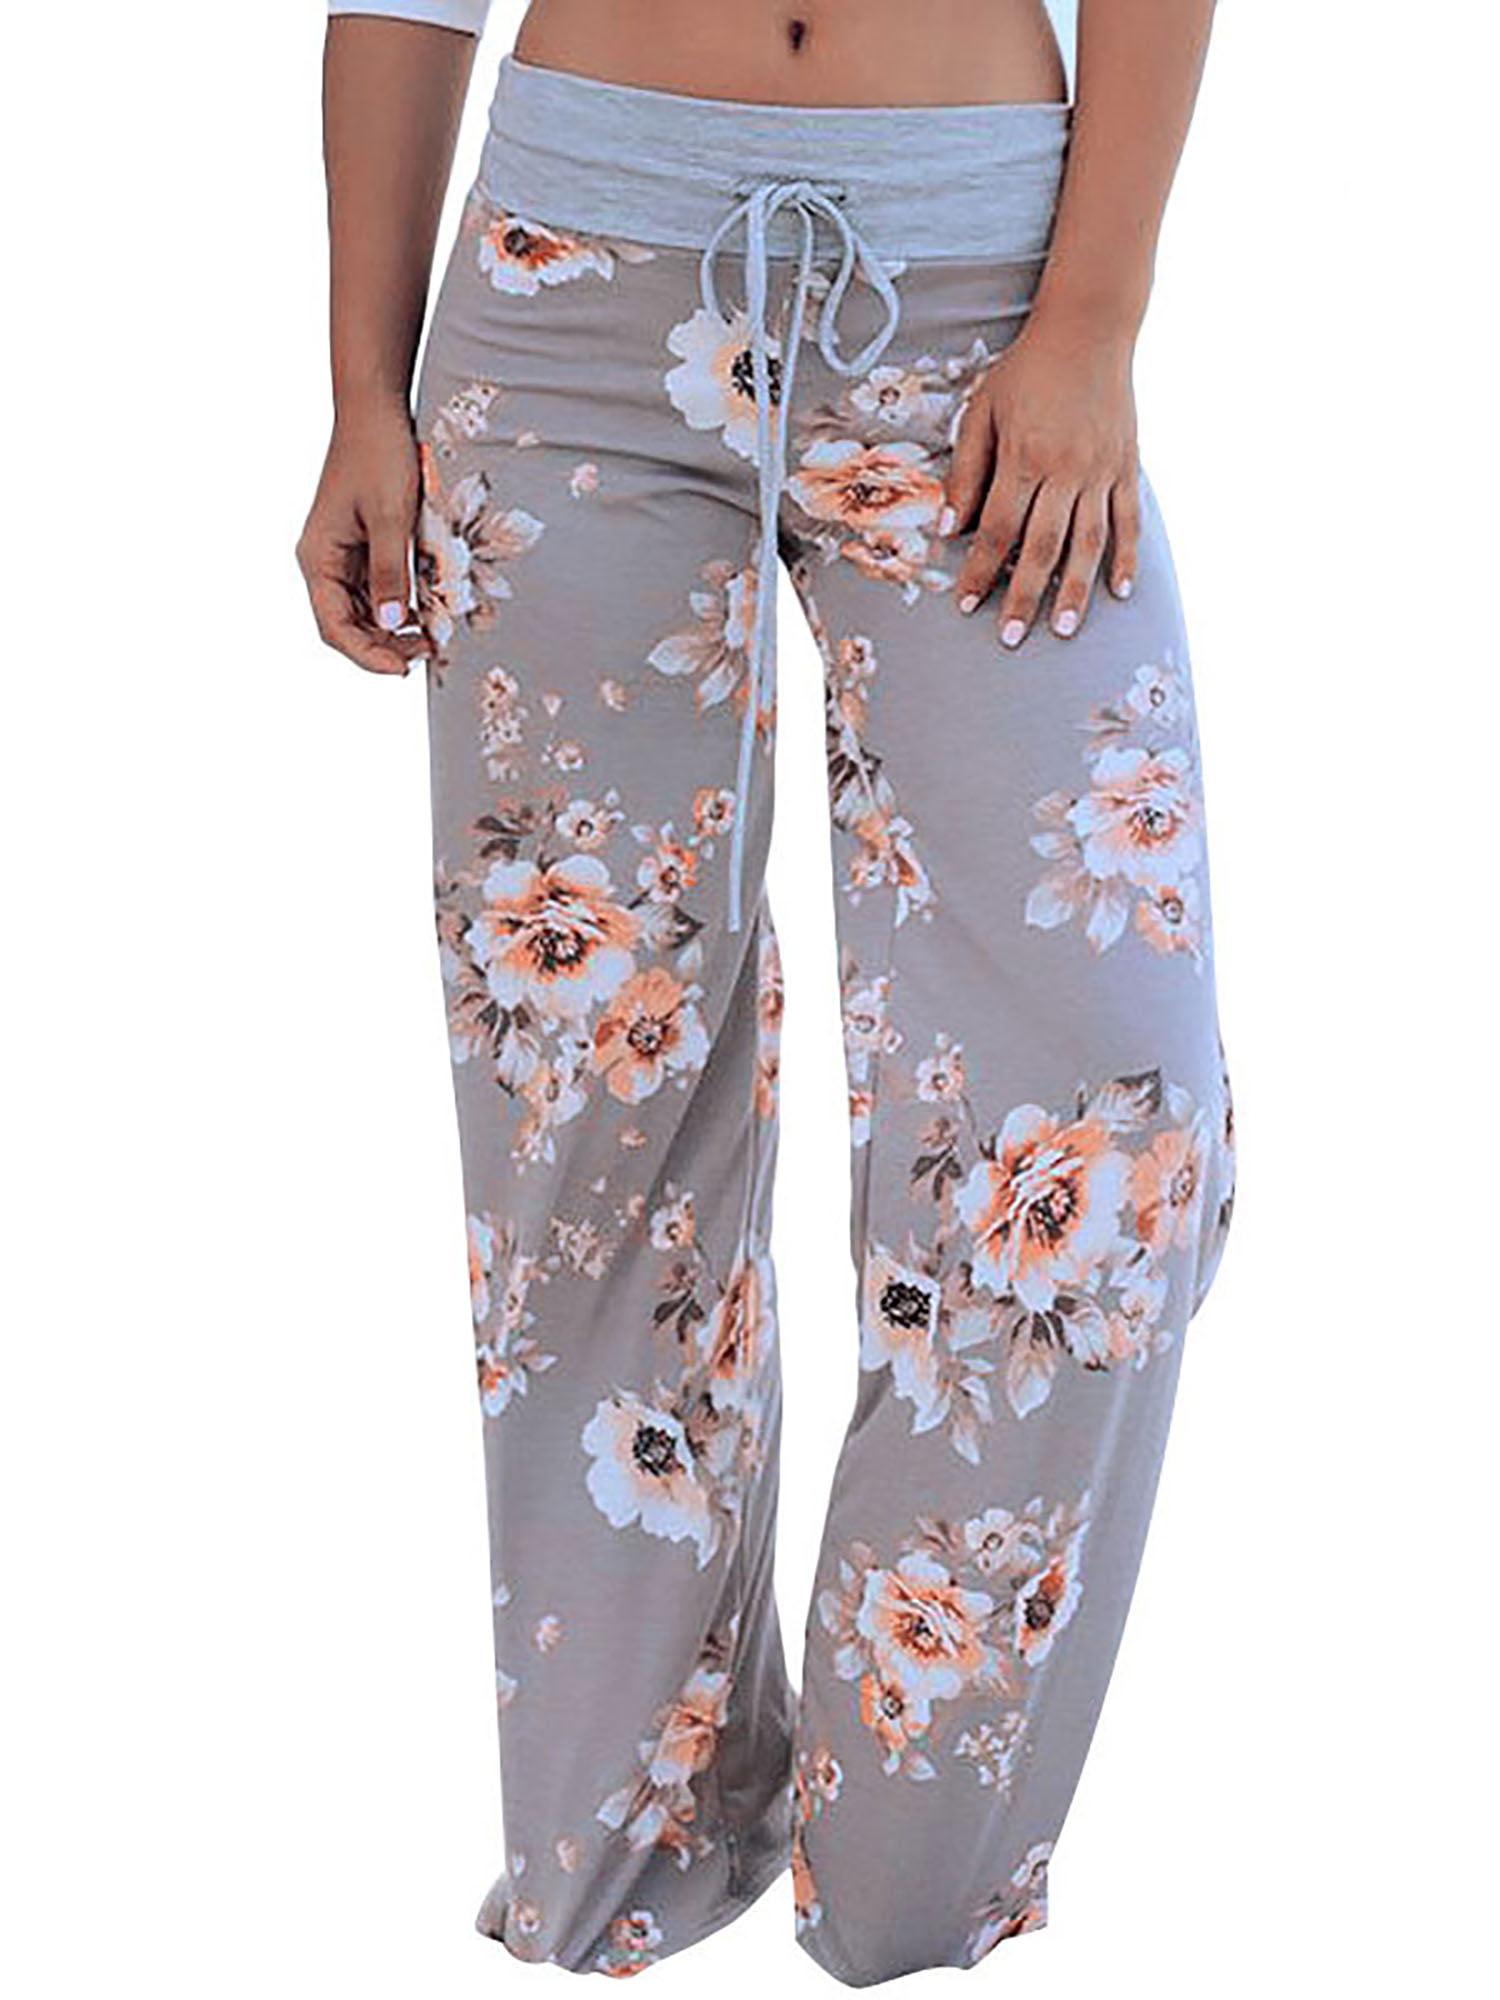 SALE Dhoti Silk Hareem Pant Silver lounge wear pyjamas sleep wear travel pants alibaba comfy cozy relaxed fit yoga wear